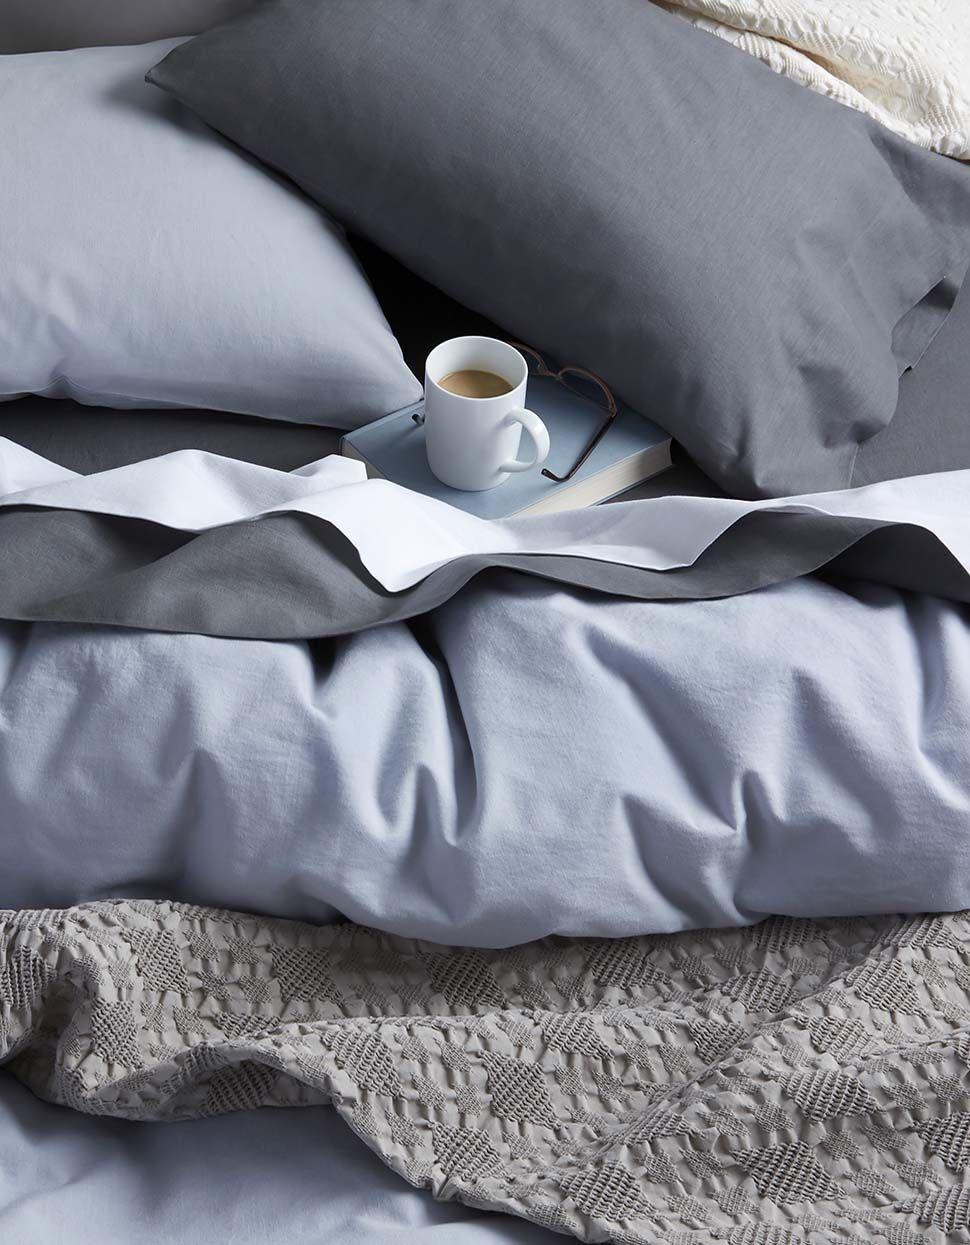 Cotton Linen Duvet Cover Set Linen Duvet Duvet Cover Sets